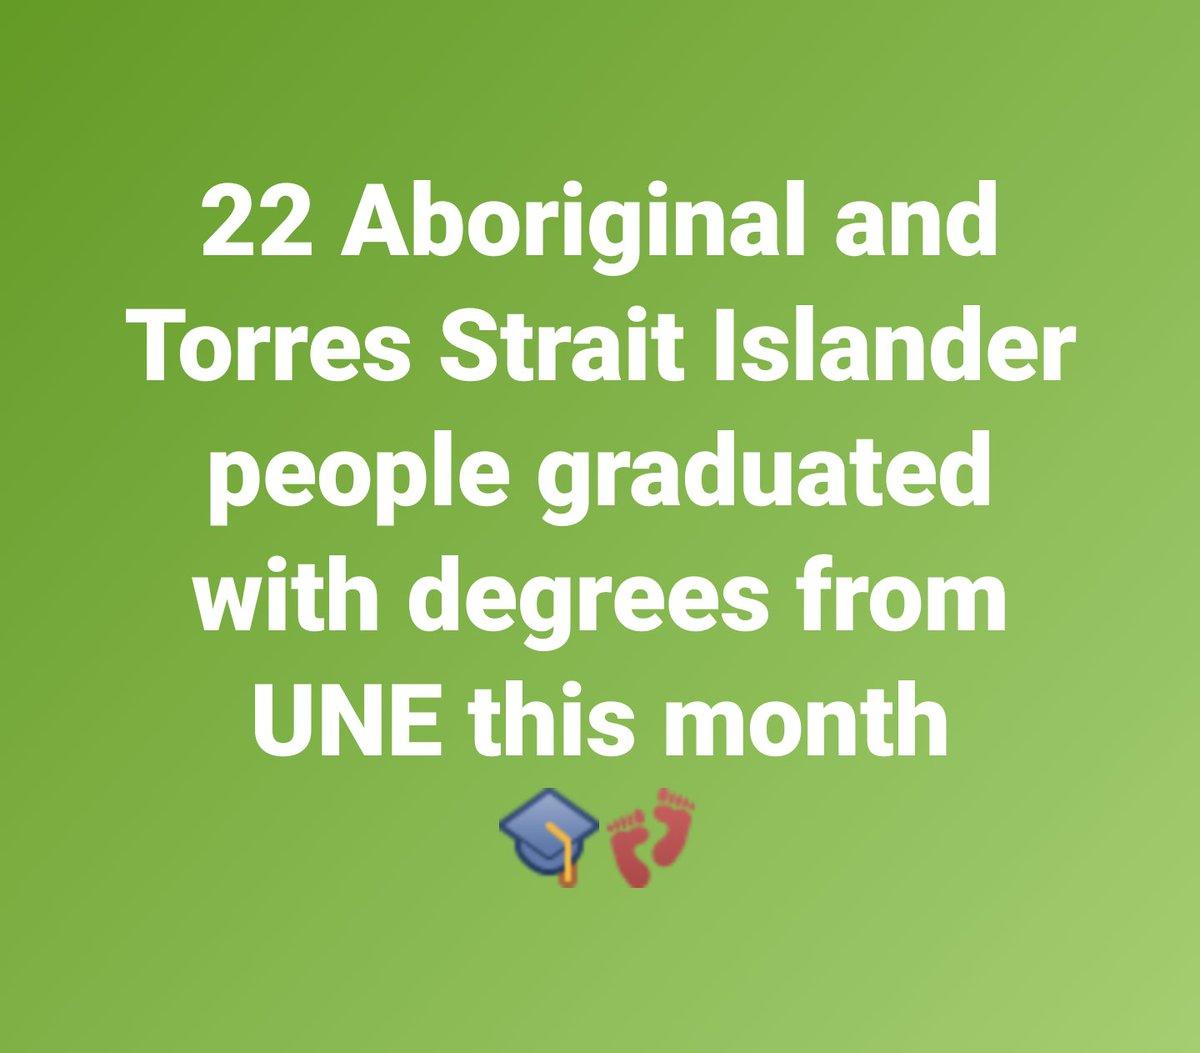 Good news everyone #IndigenousX #UNE #Aboriginal #Koori #Murri #Indigenous #HigherEd #IndigenousEducation #University #WIPCE #deadly #Oorala<br>http://pic.twitter.com/oafaVwpL2m